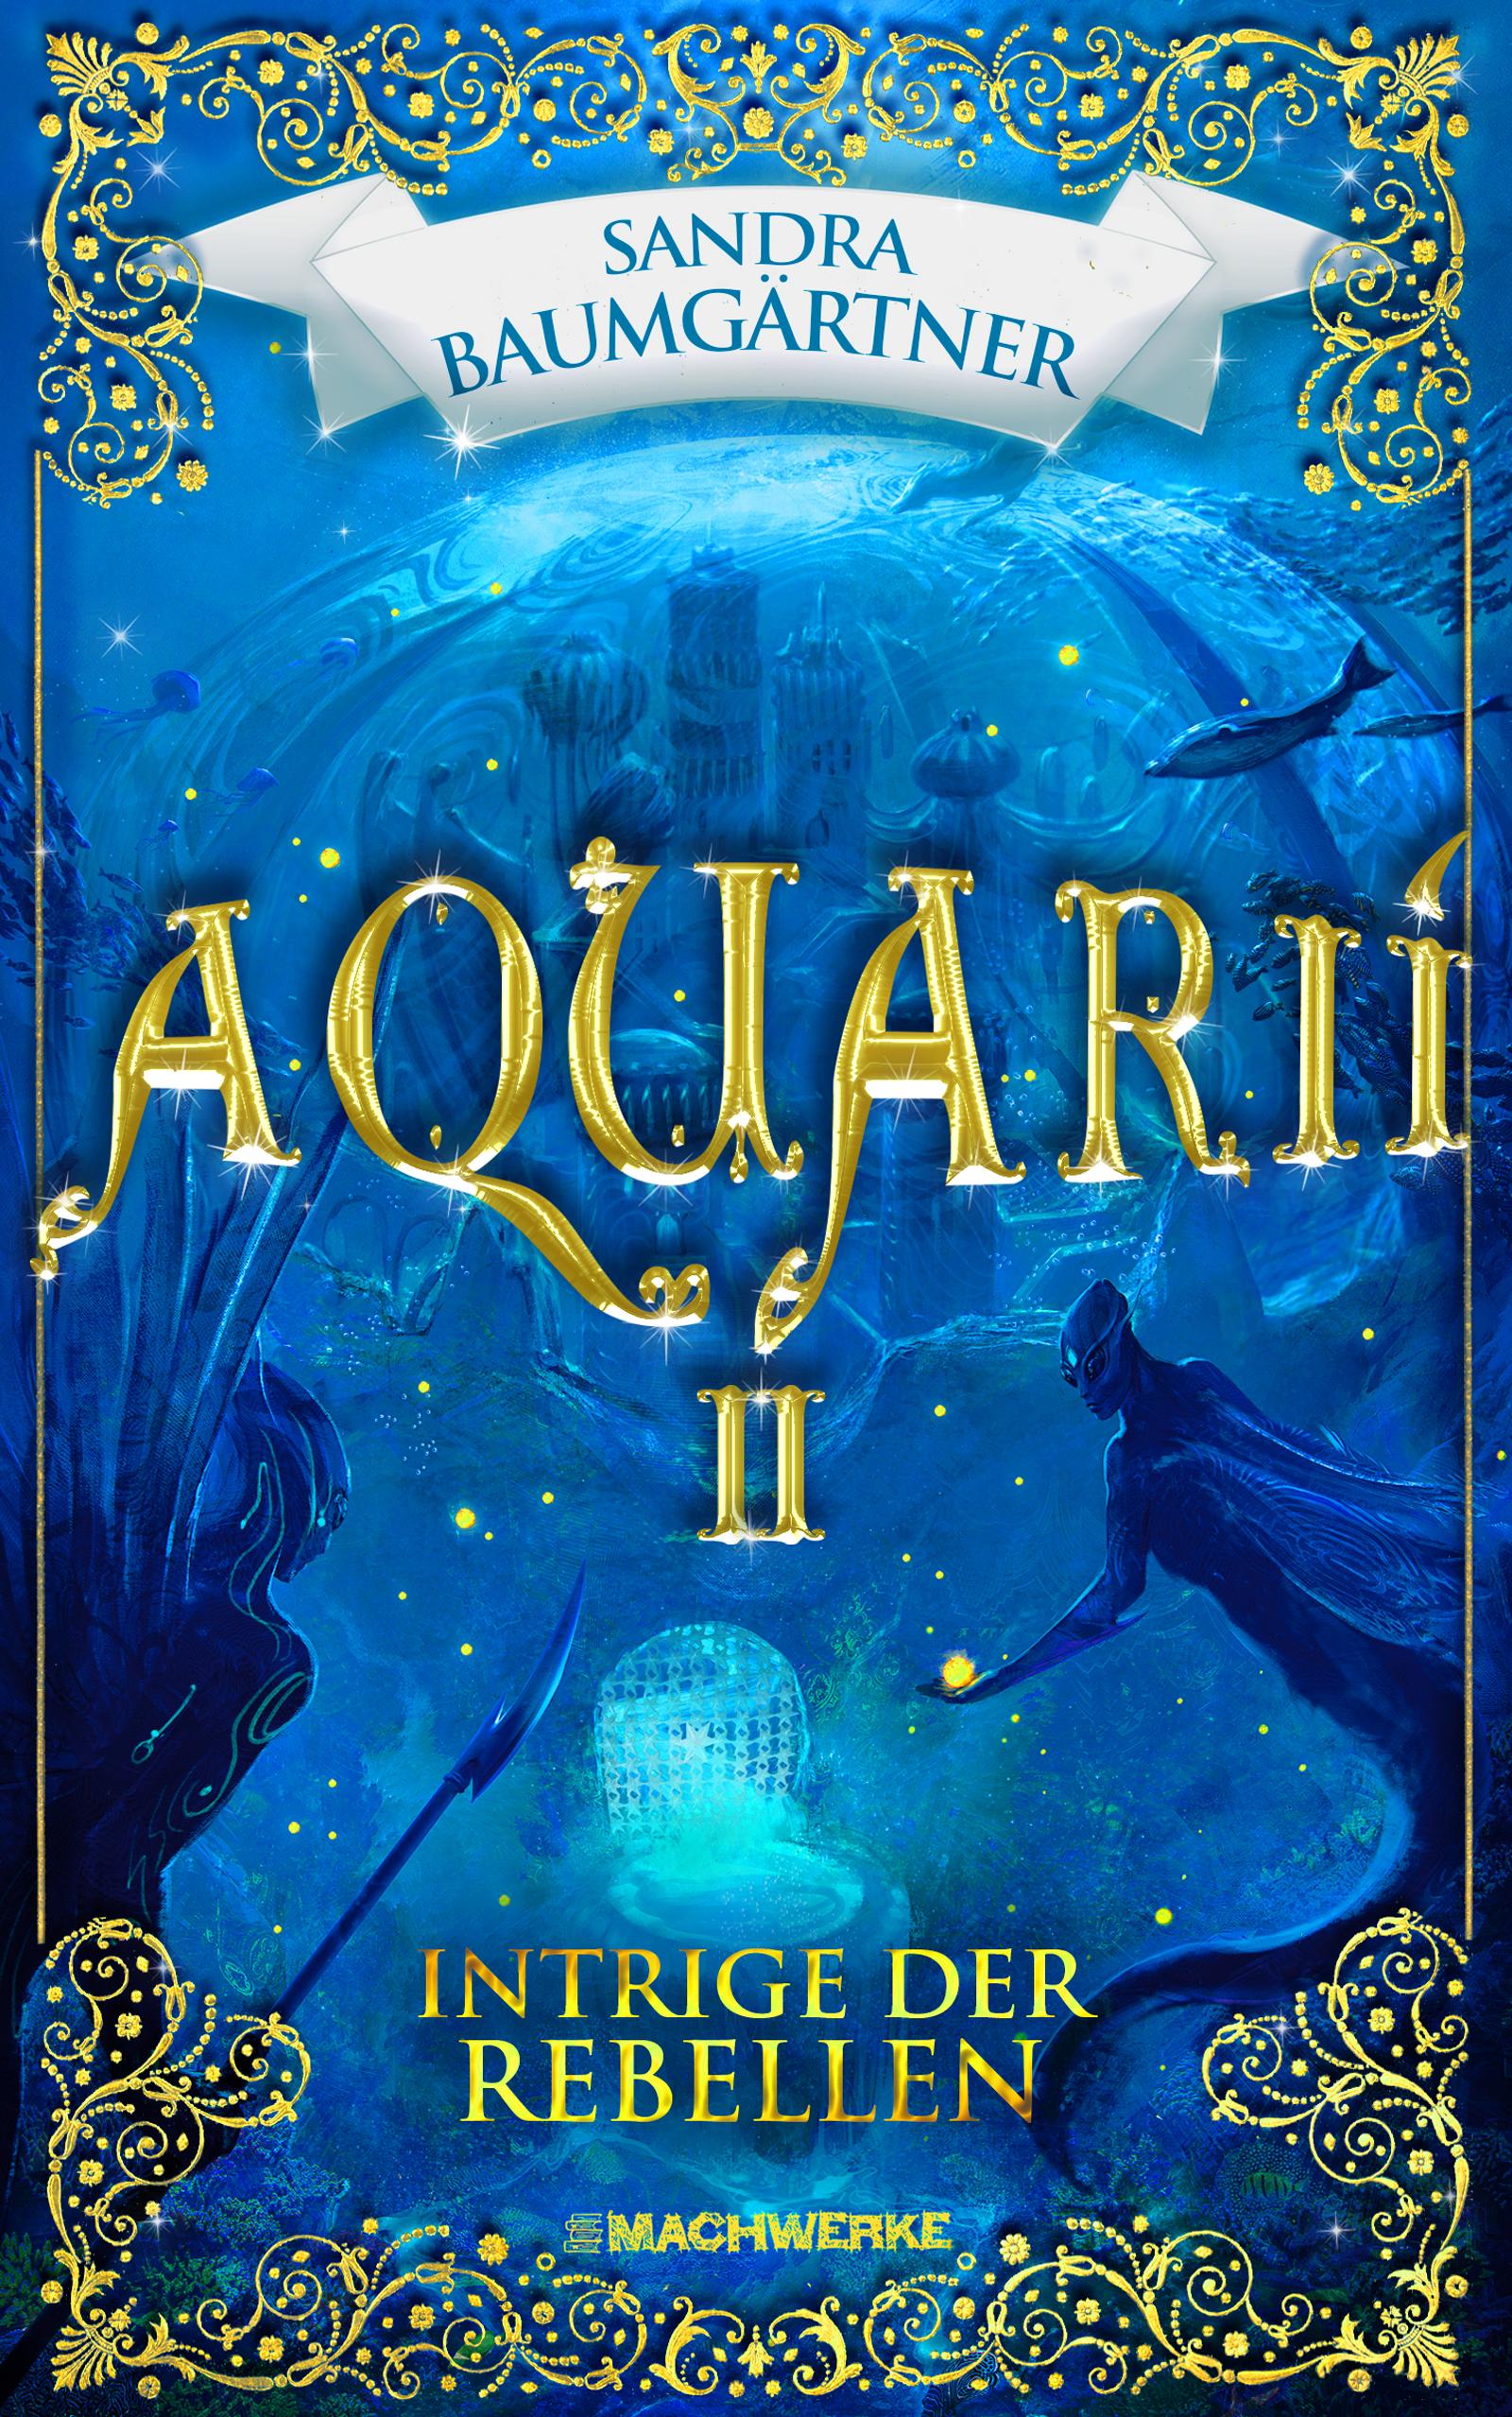 Aquarii_Intirge_der_Rebellen_Sandra_Baumgaertner_Fantasy_Machwerke